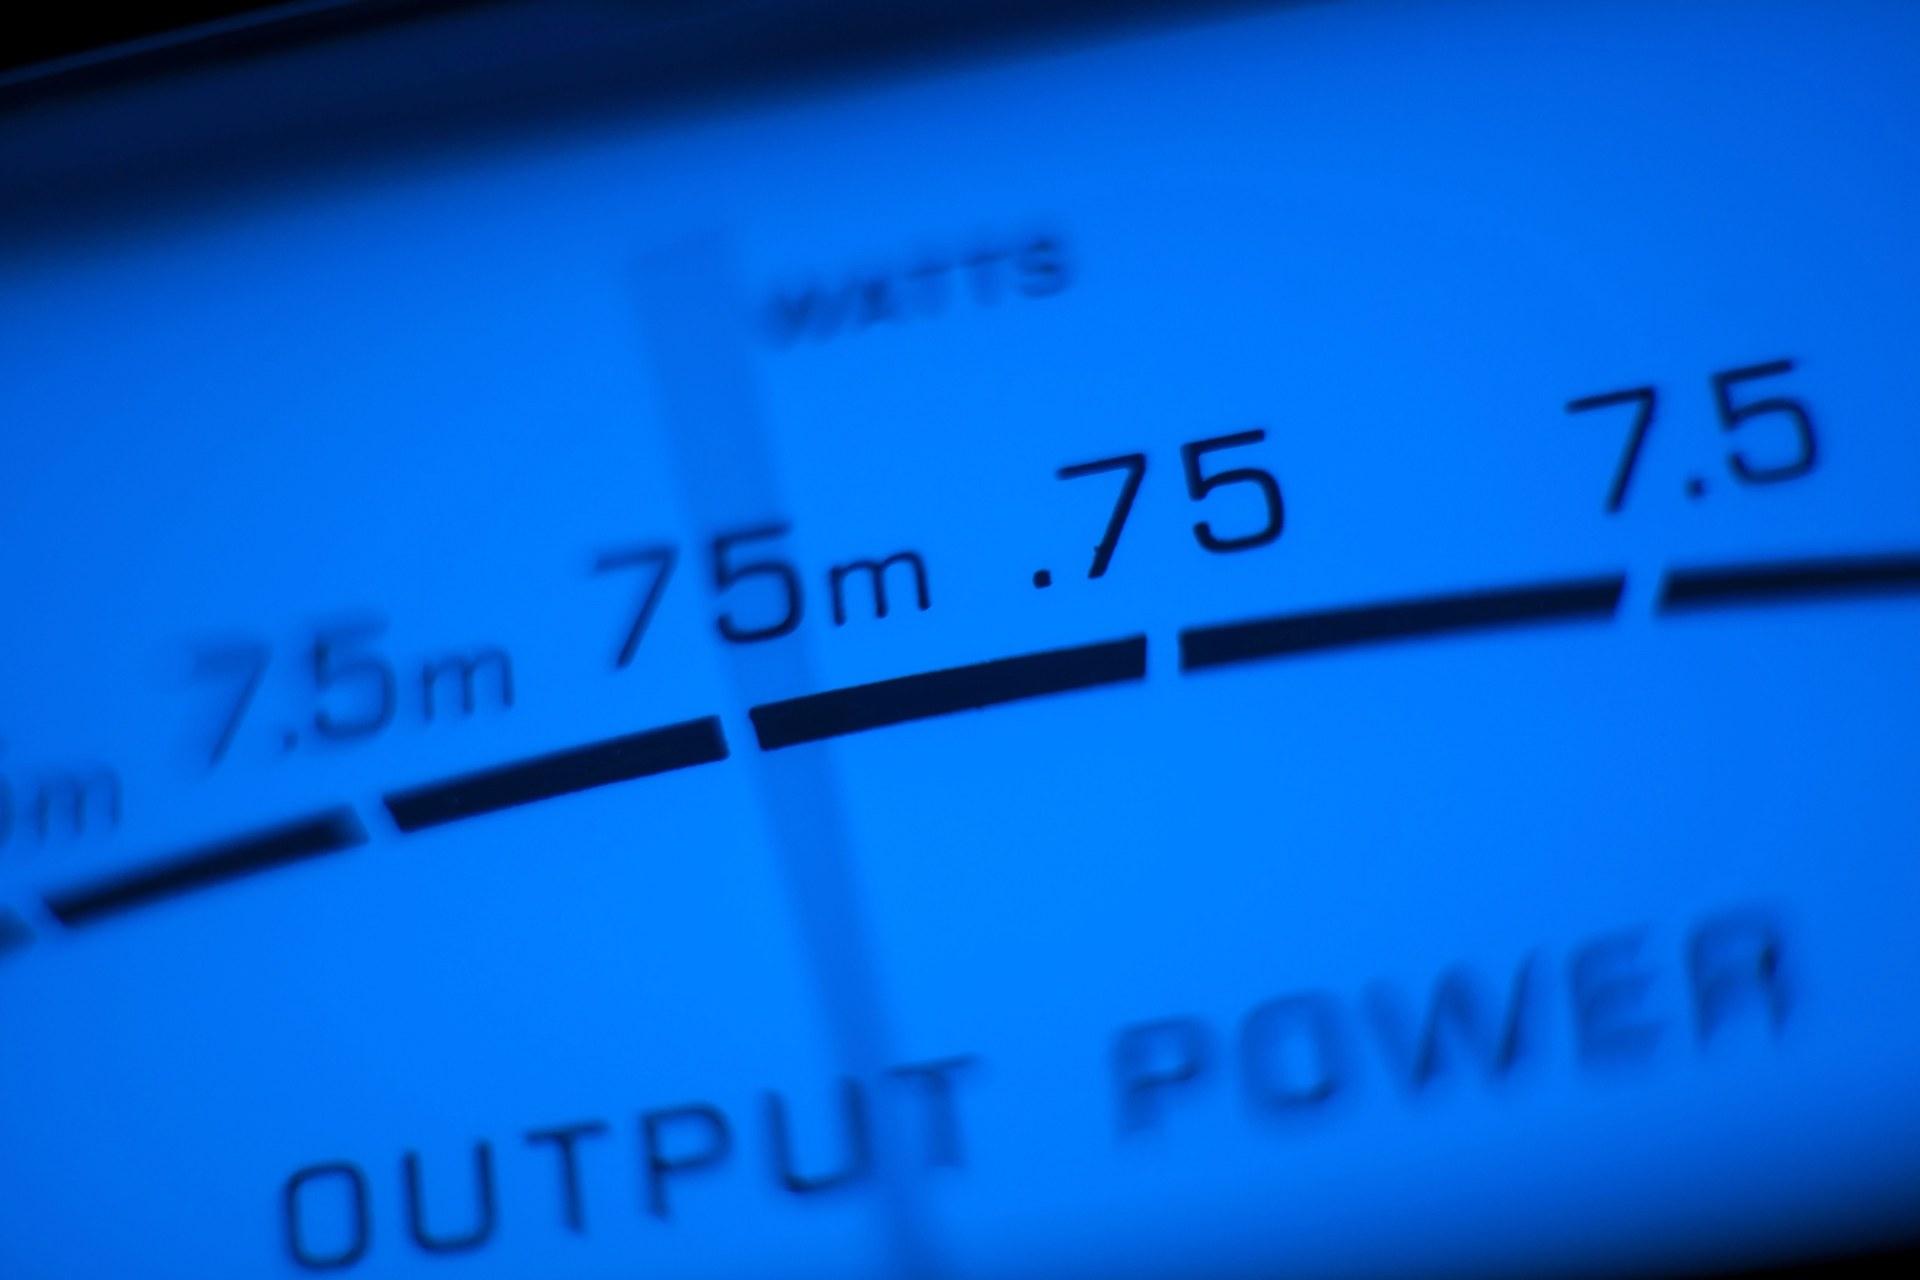 Hey McIntosh Fans Heres a Power Meter Desktop Wallpaper For You 1920x1280